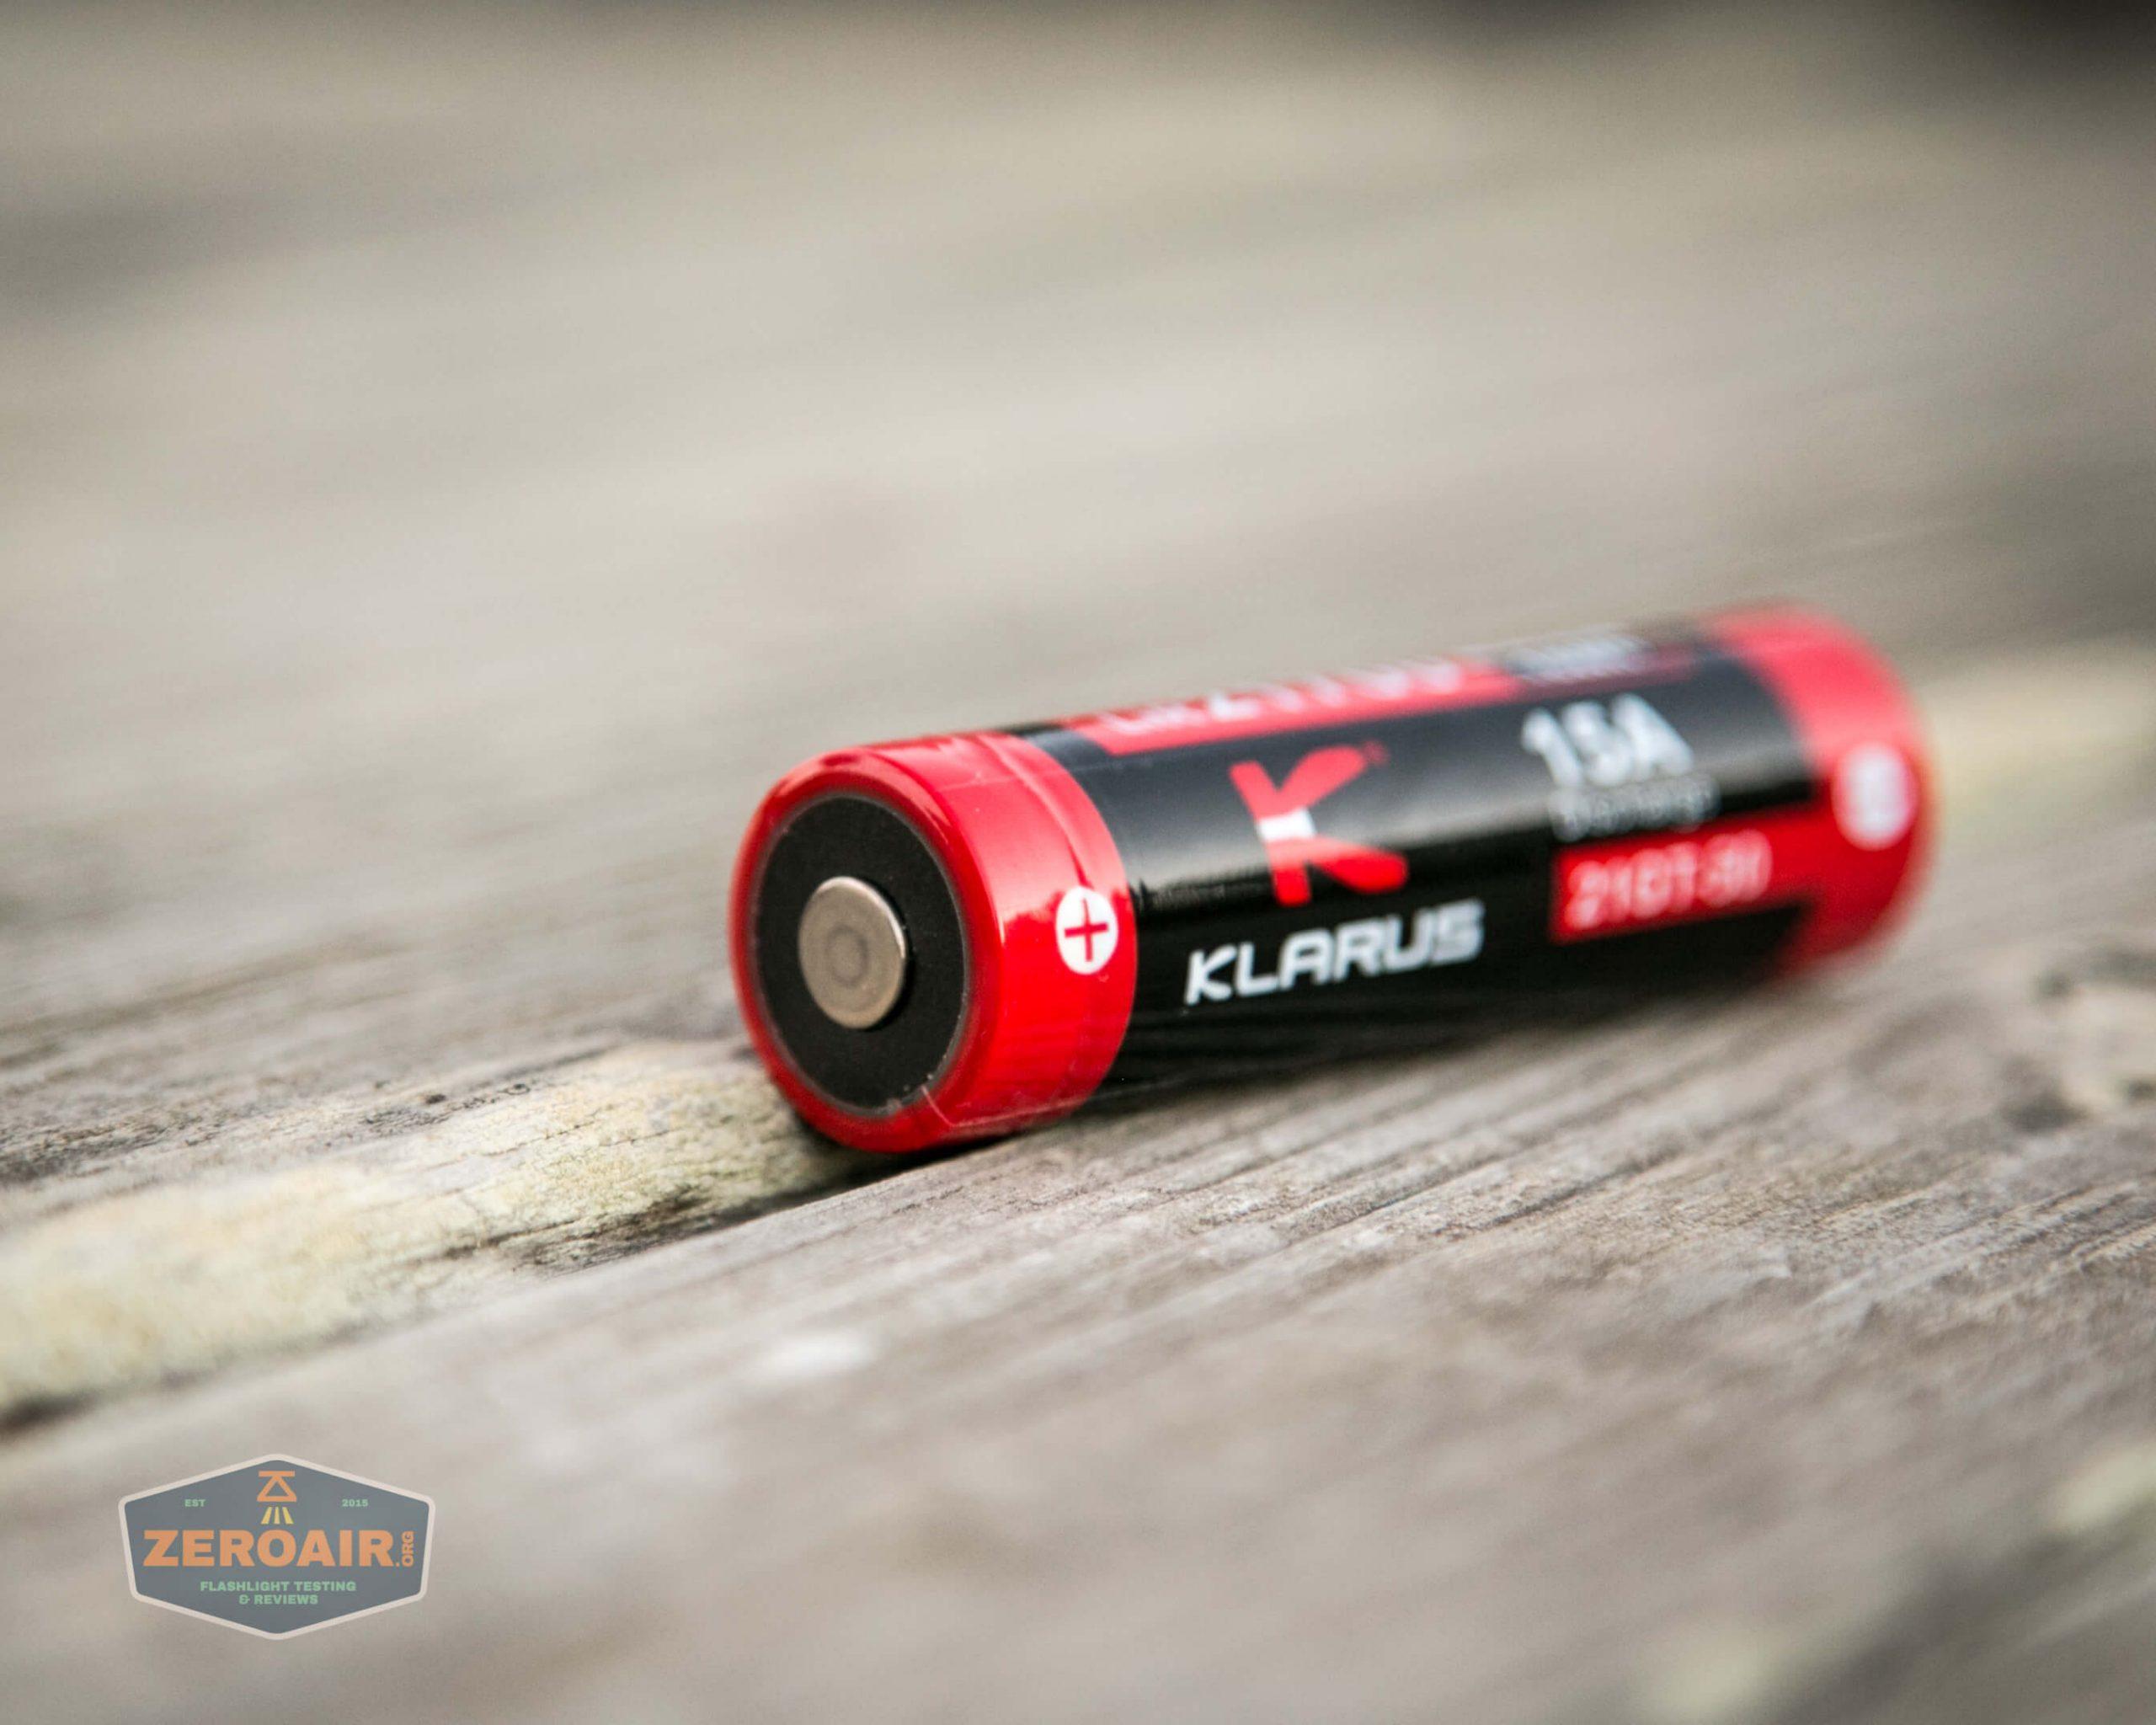 klarus g25 21700 cree xhp70.2 flashlight cell positive button